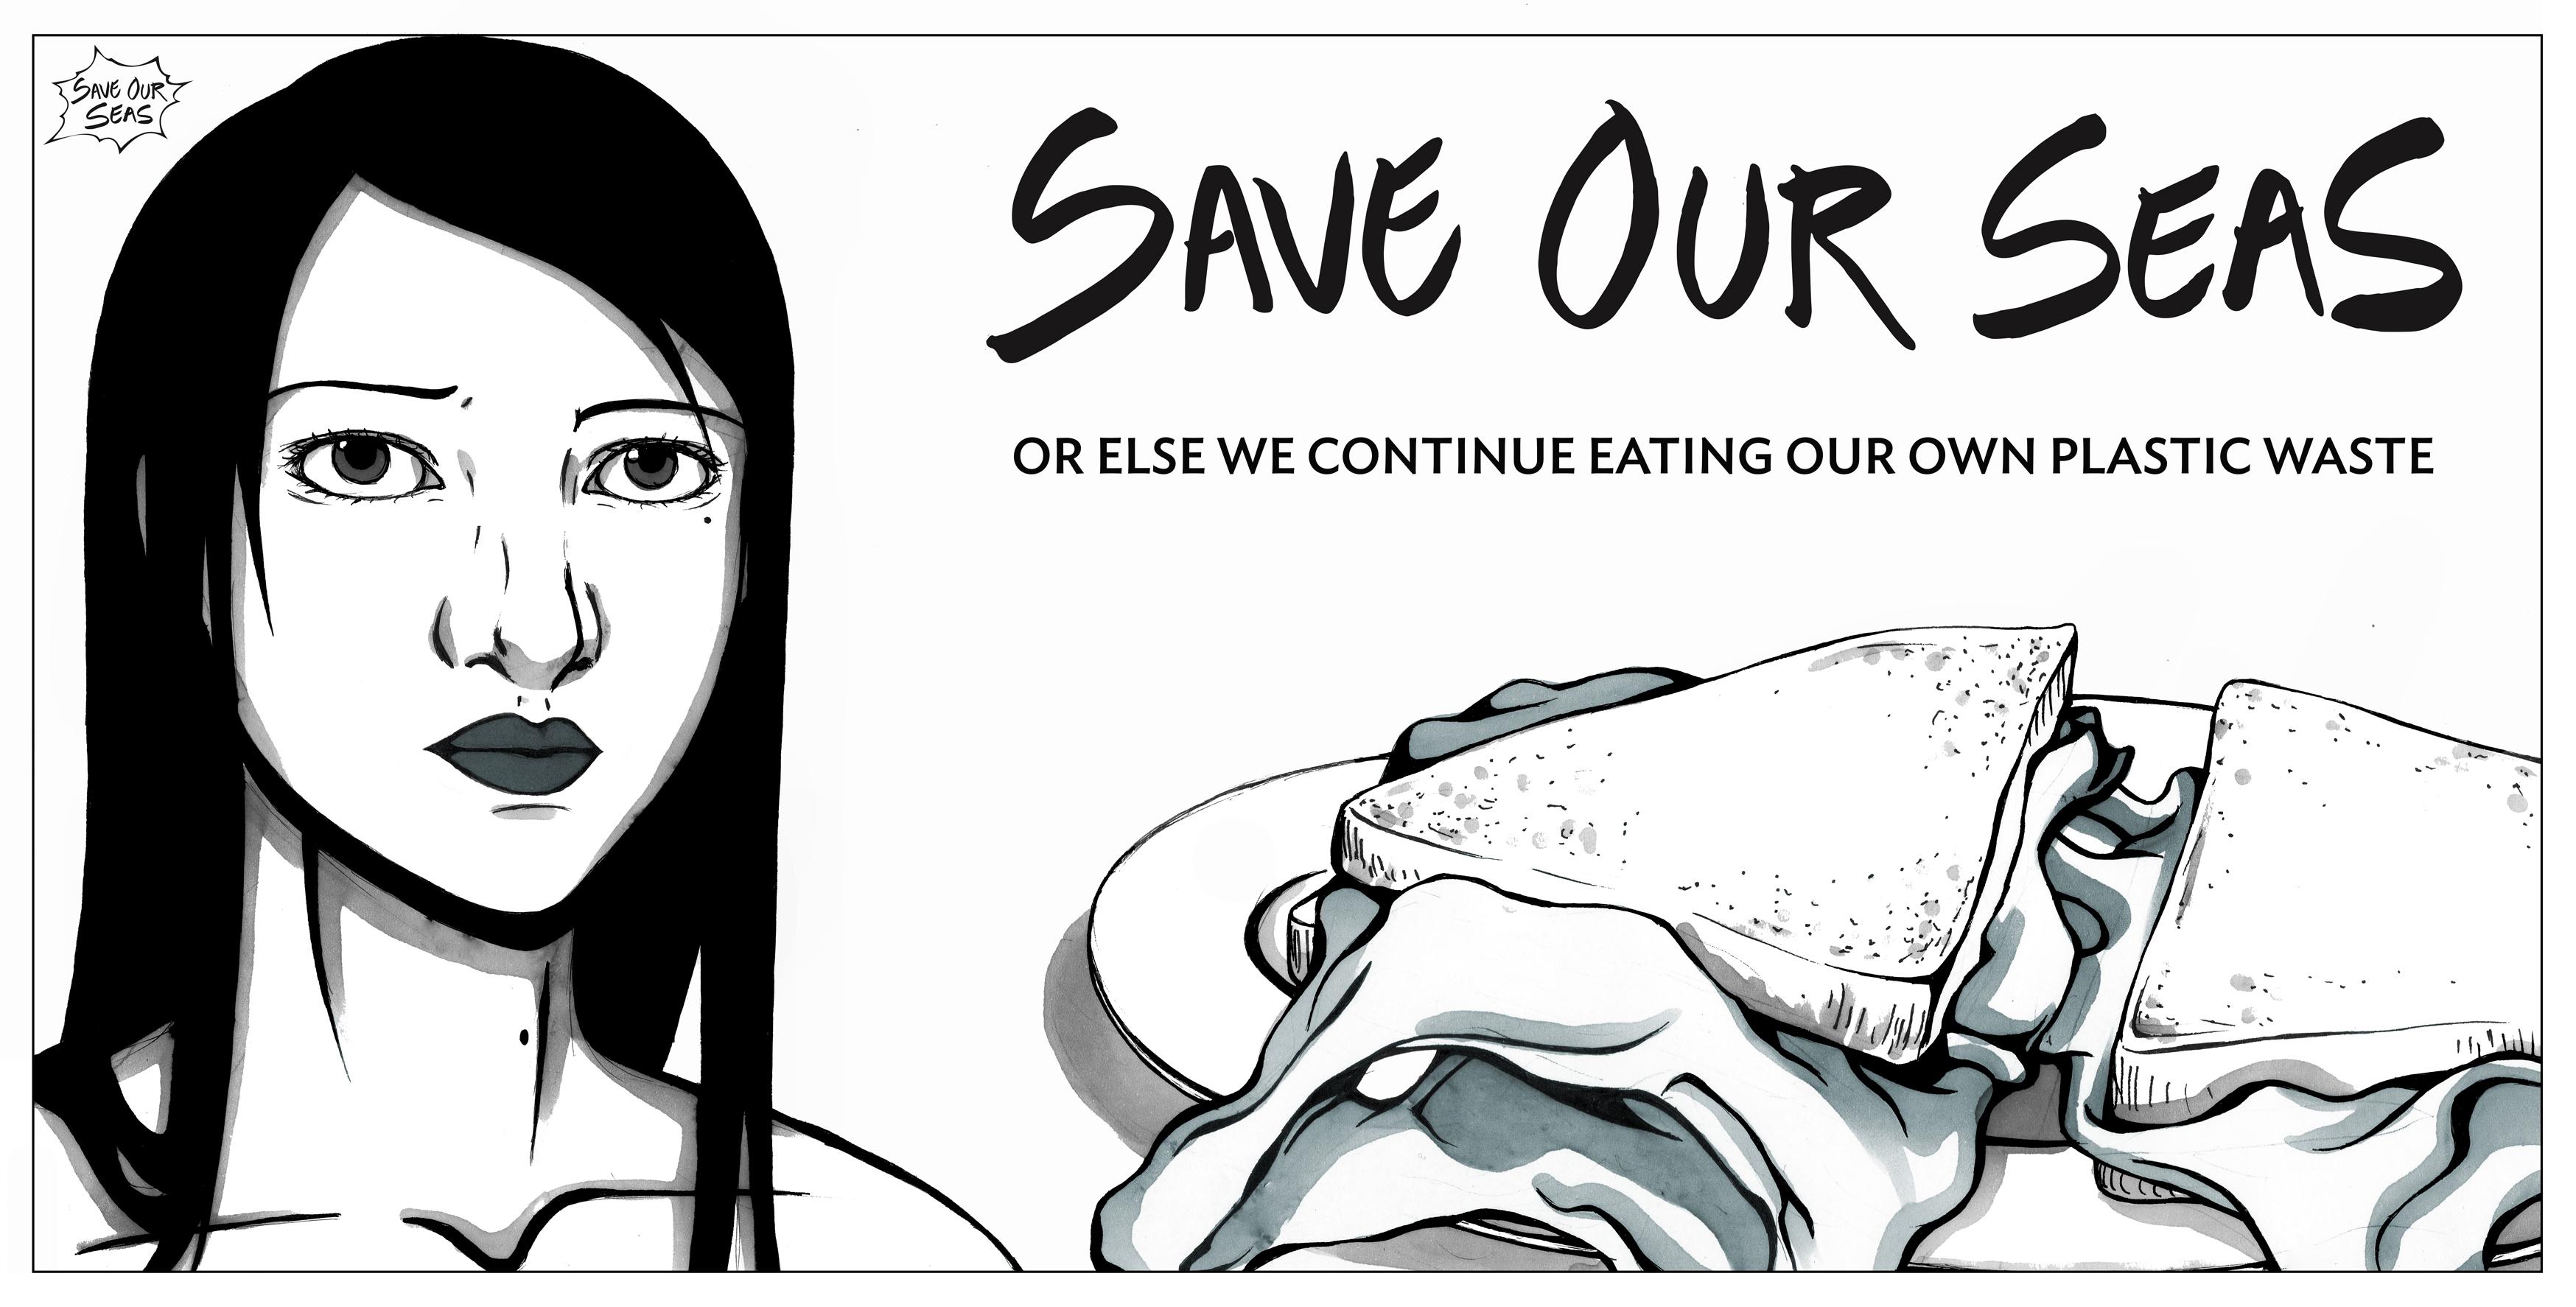 Save Our Seas (Billboard Design 1)